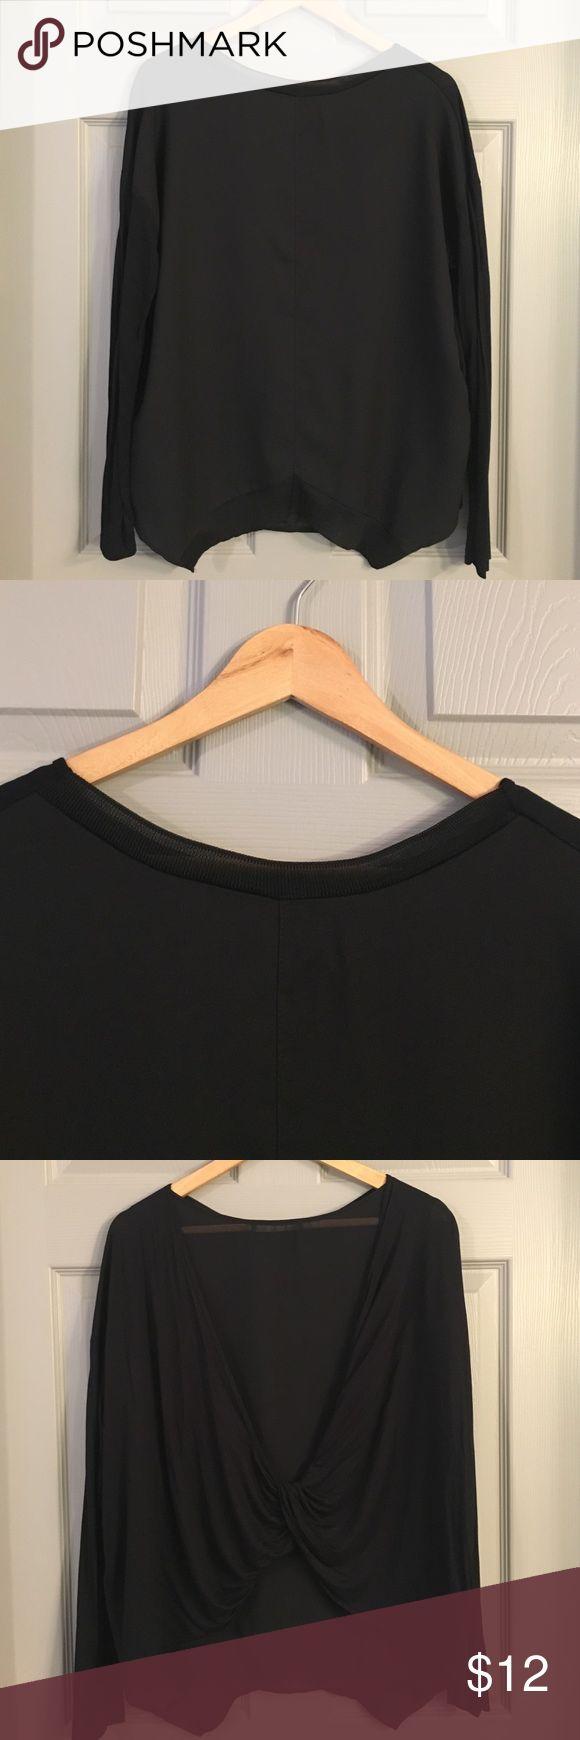 ZARA top Zara top with awesome sheer back detail Zara Tops Blouses